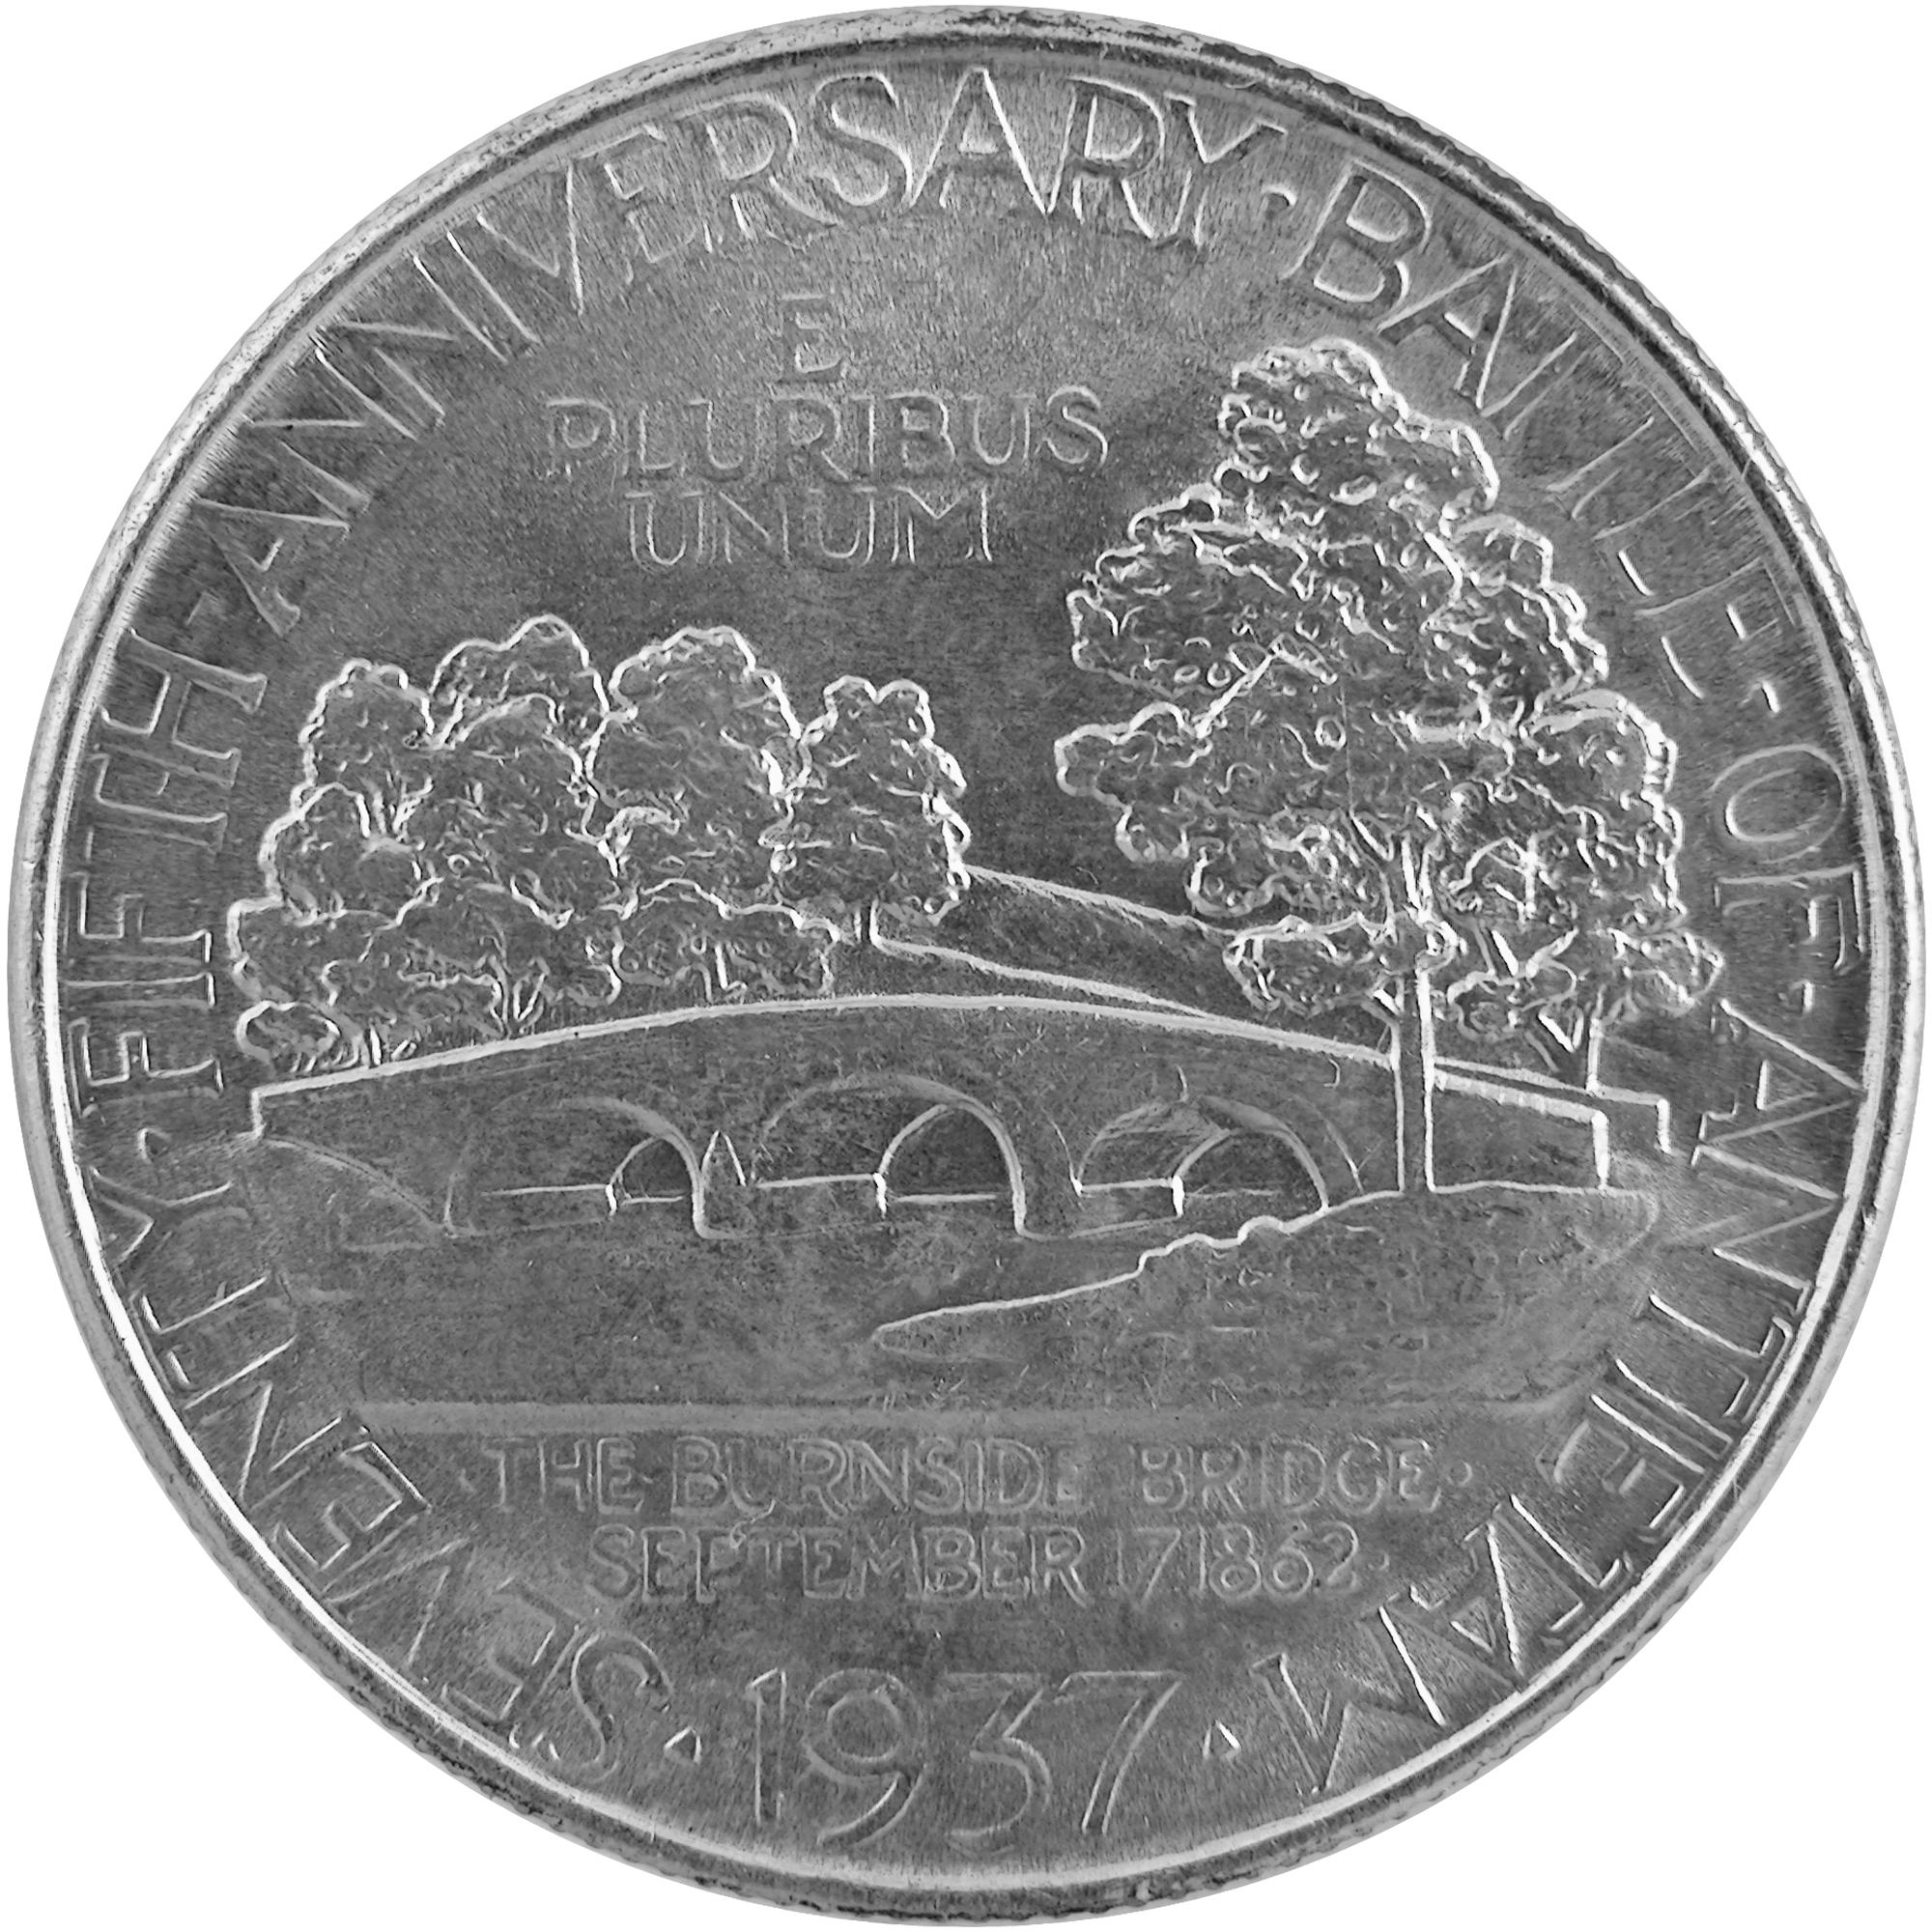 1937 Battle Of Antietam Seventy Fifth Anniversary Commemorative Silver Half Dollar Coin Reverse